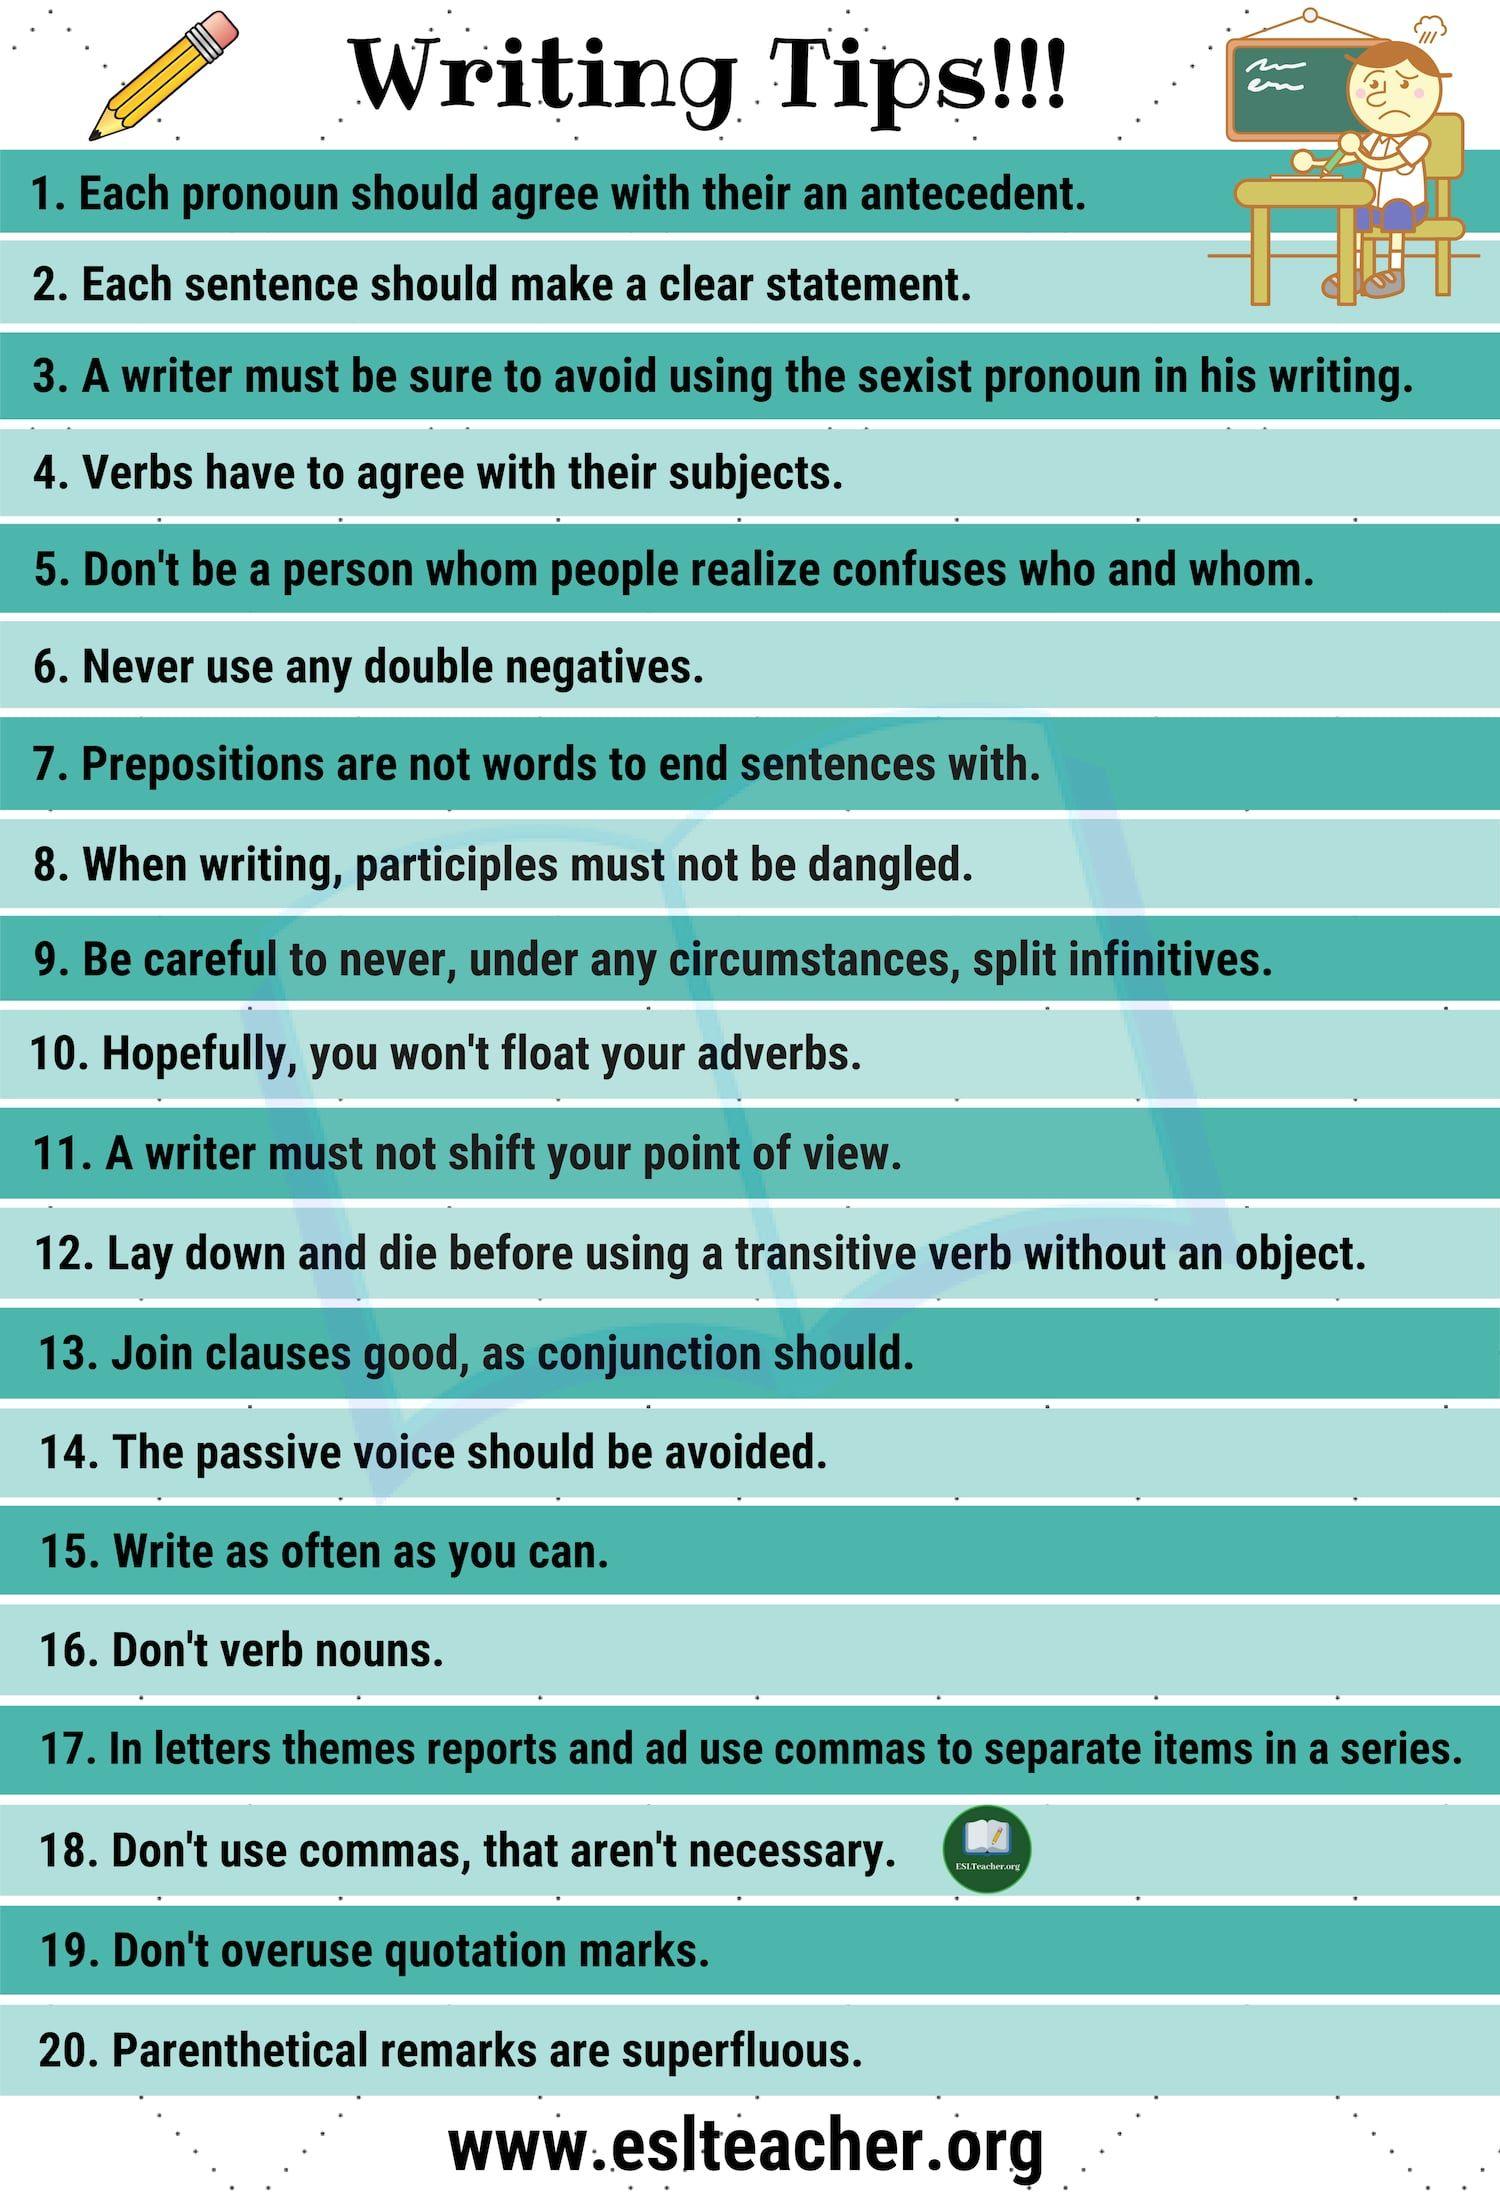 English writing help